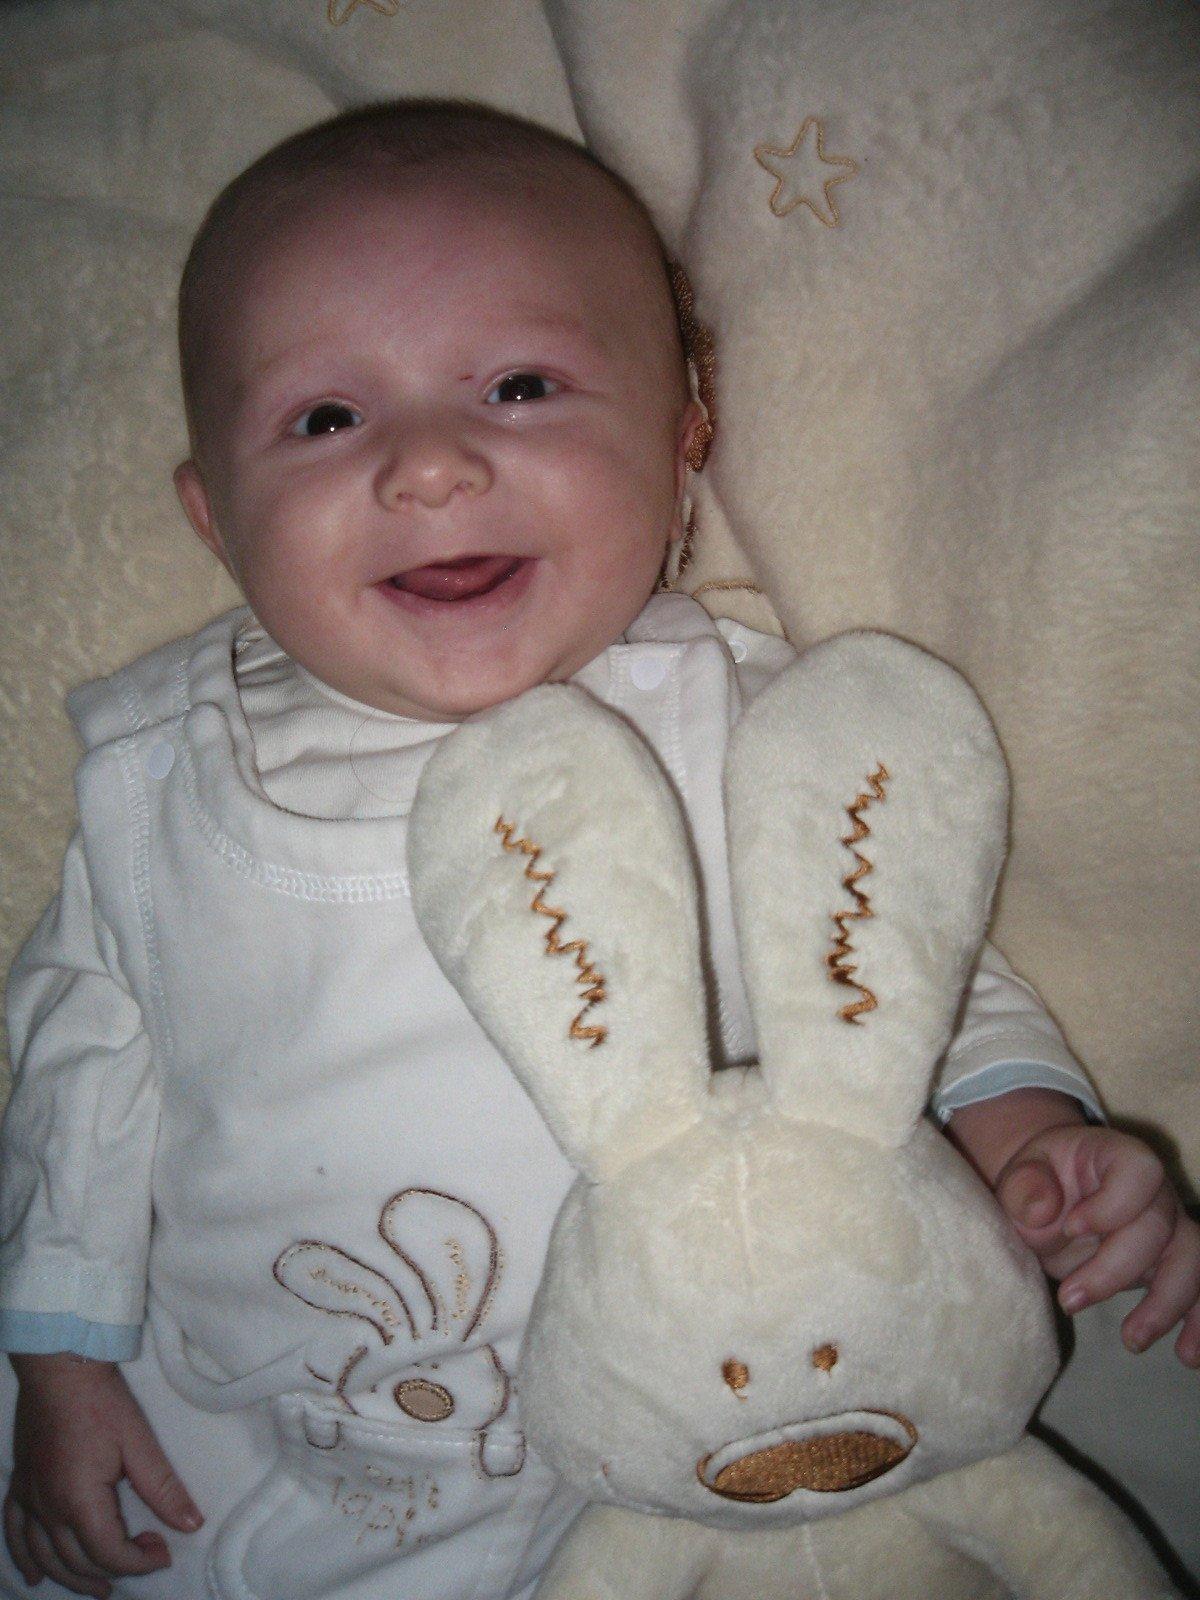 Gabriel et lapin blanc 2